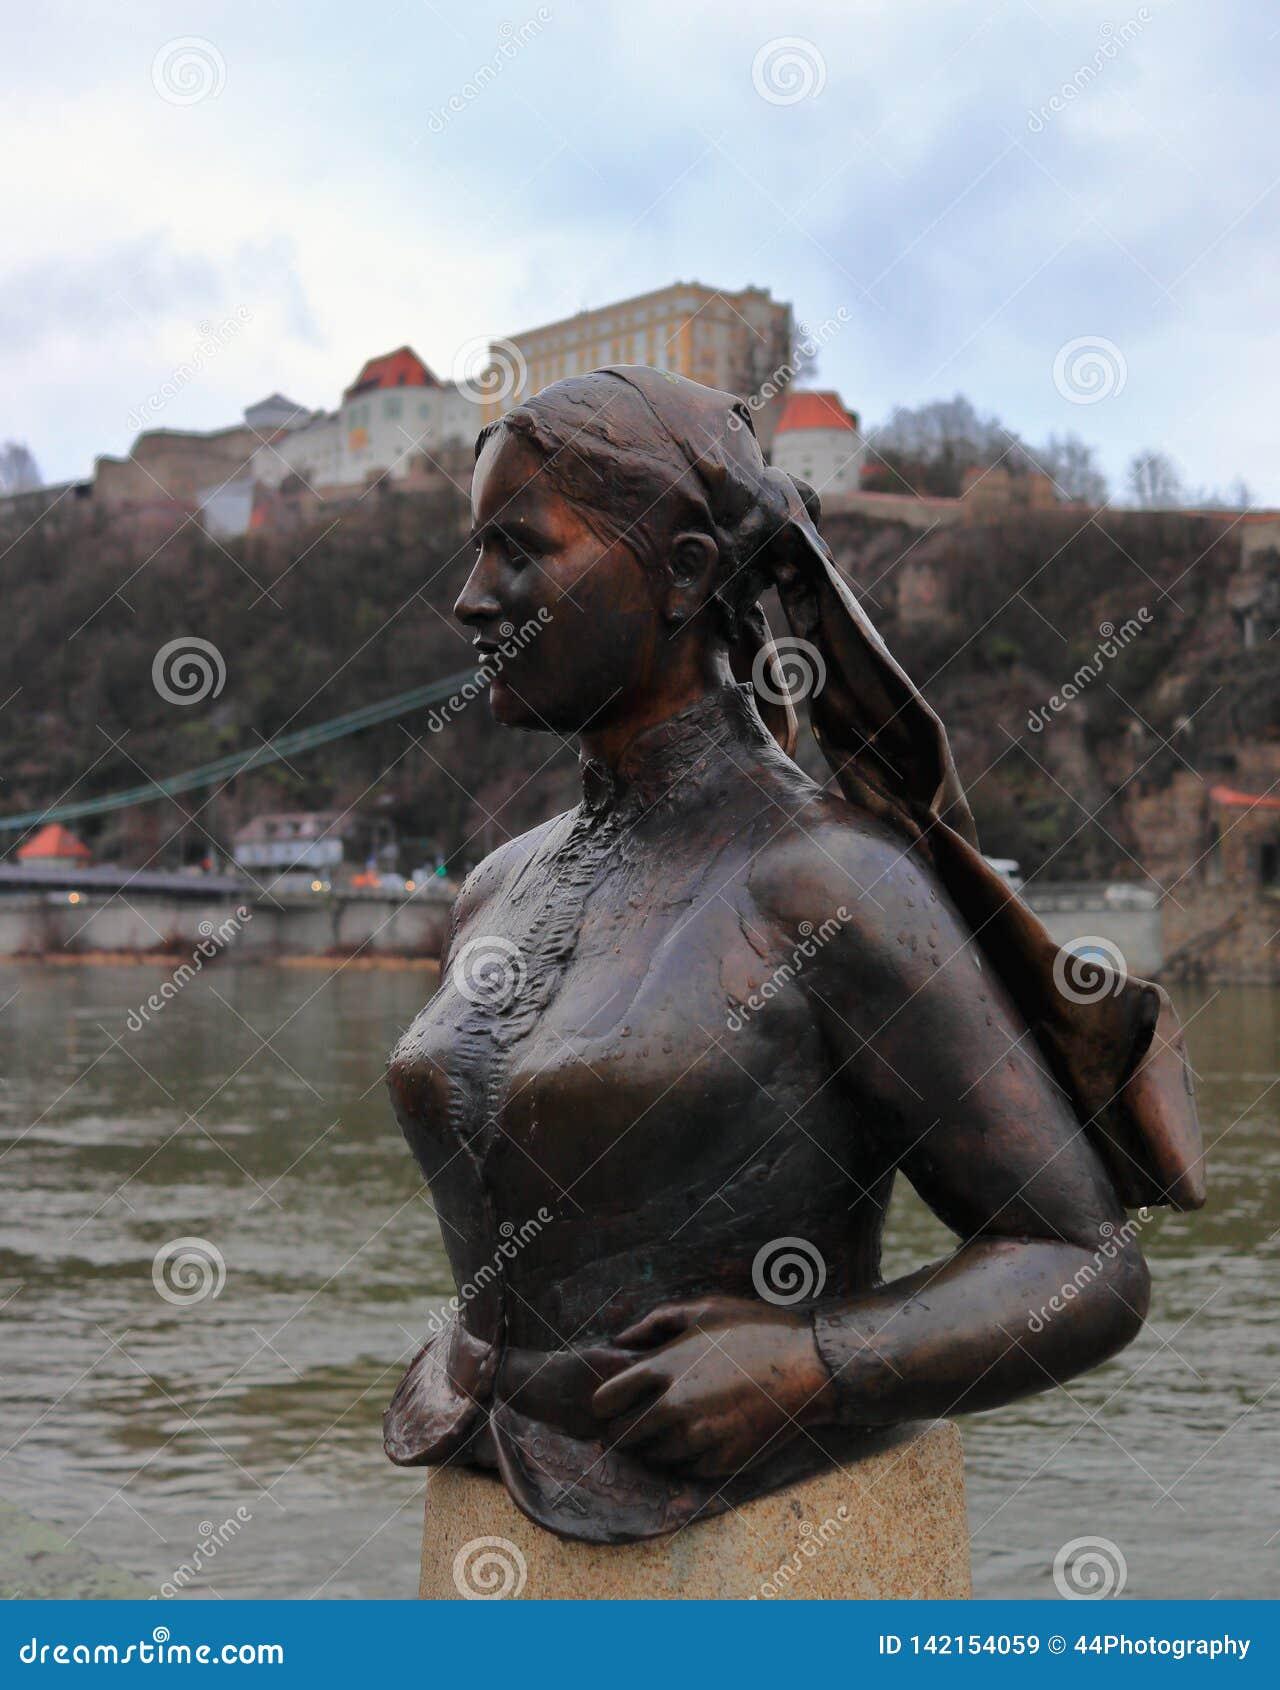 PASSAU, BAVARIA, GERMANY - MARCH 12, 2019: The bronze bust of Emerenz Meier, a Bavarian folk poetess.